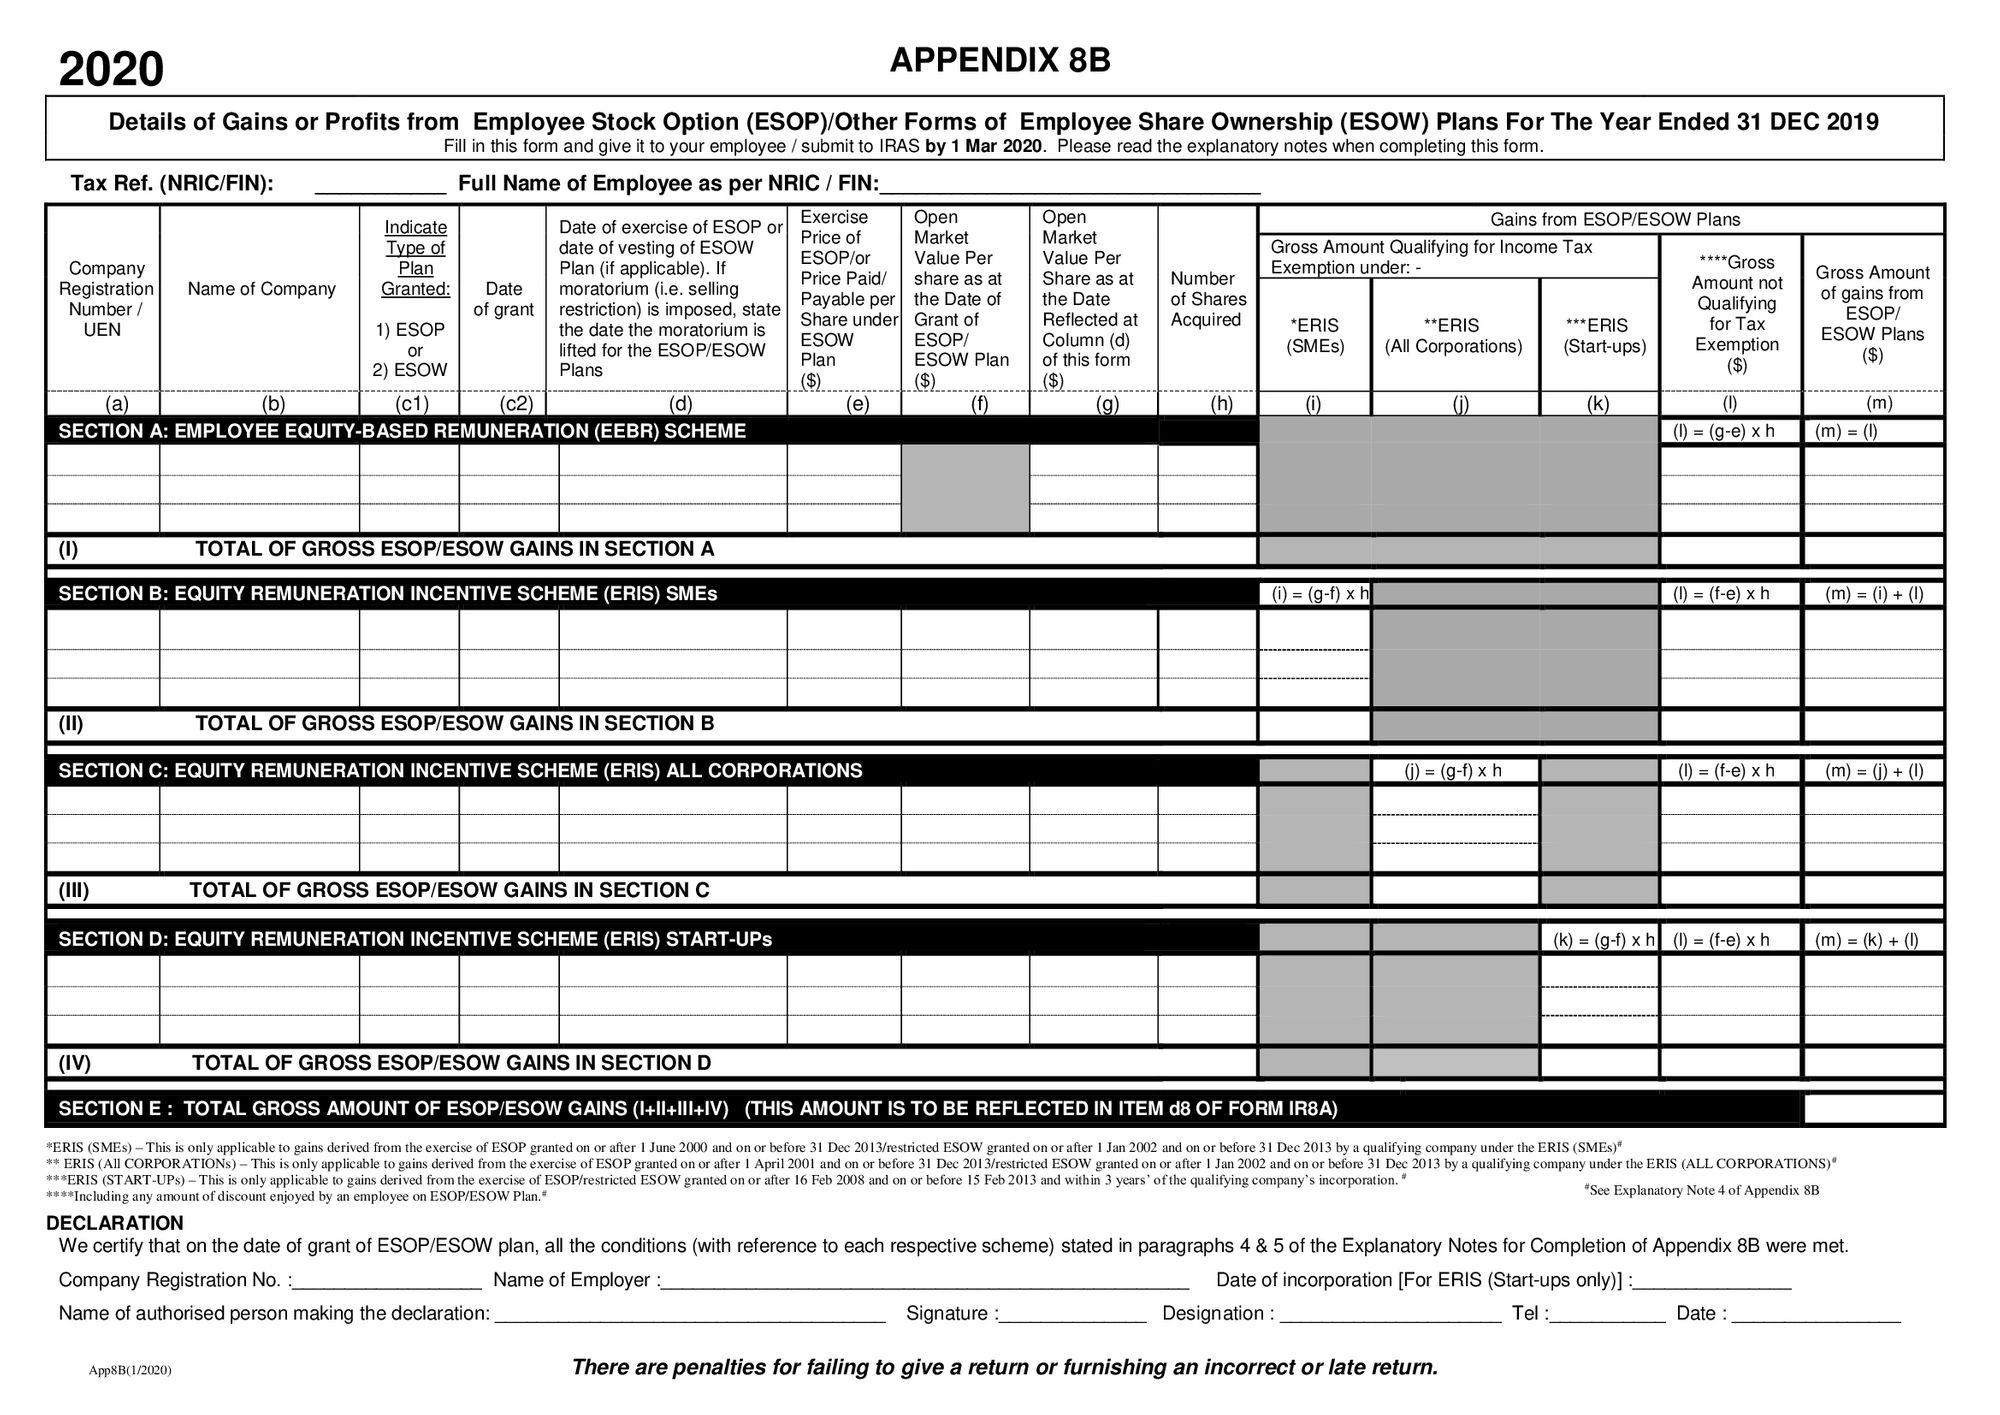 Appendix 8B example